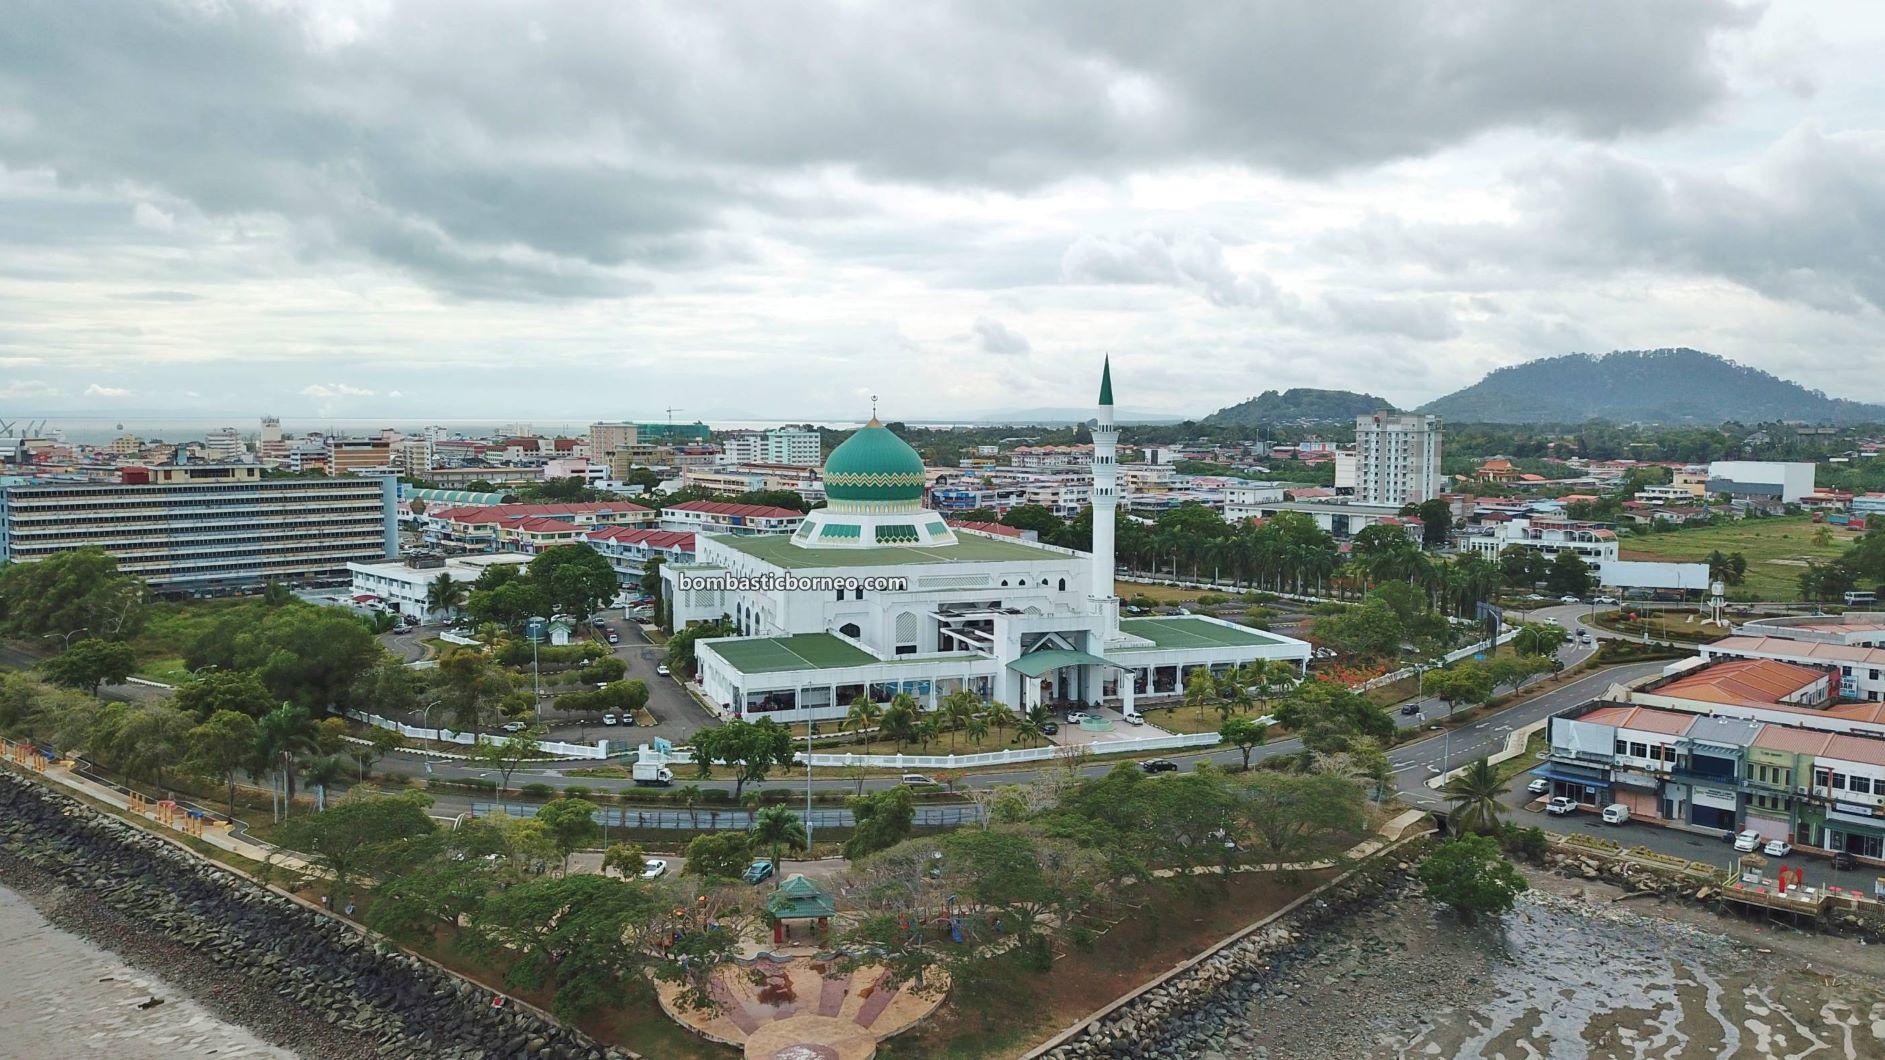 exploration, Pekan, town, Tourism, Trans Border, Borneo, 马来西亚沙巴, 斗湖清真寺